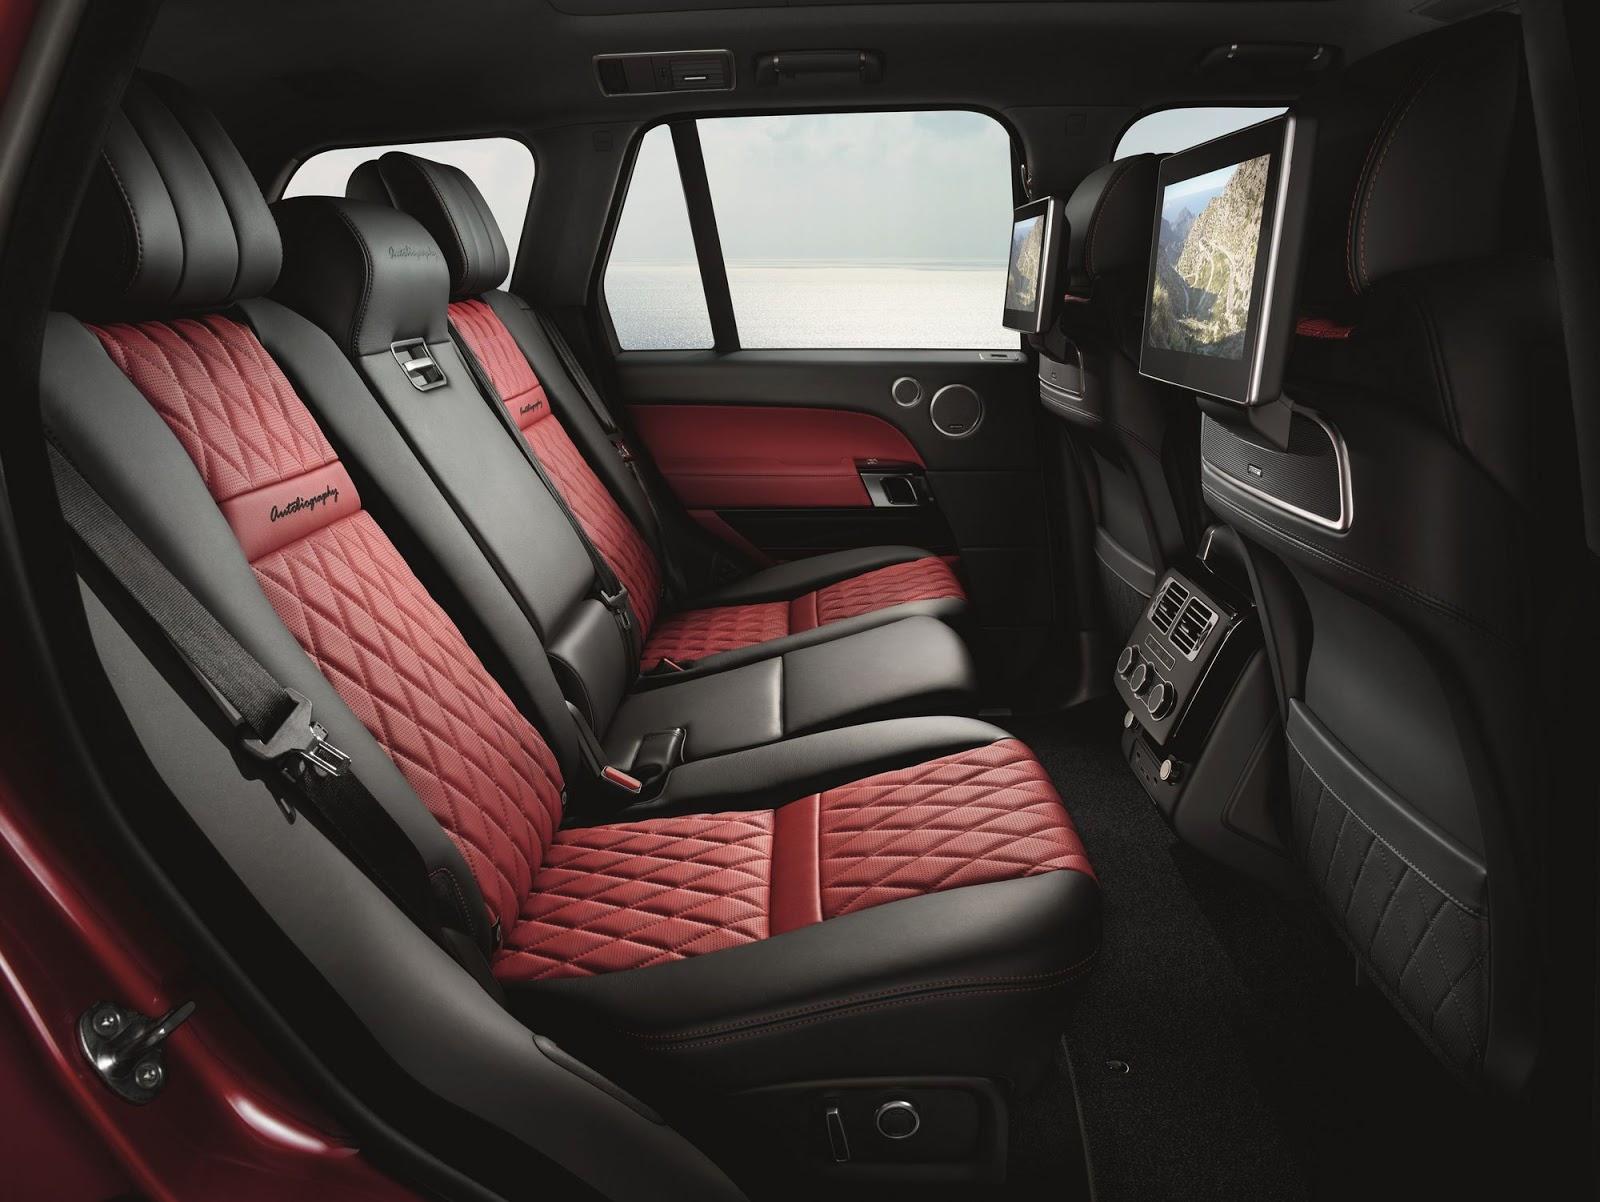 2017 - [Land Rover] Range Rover/ Sport/ SVR restylés 2017%2BRange%2BRover%2B11